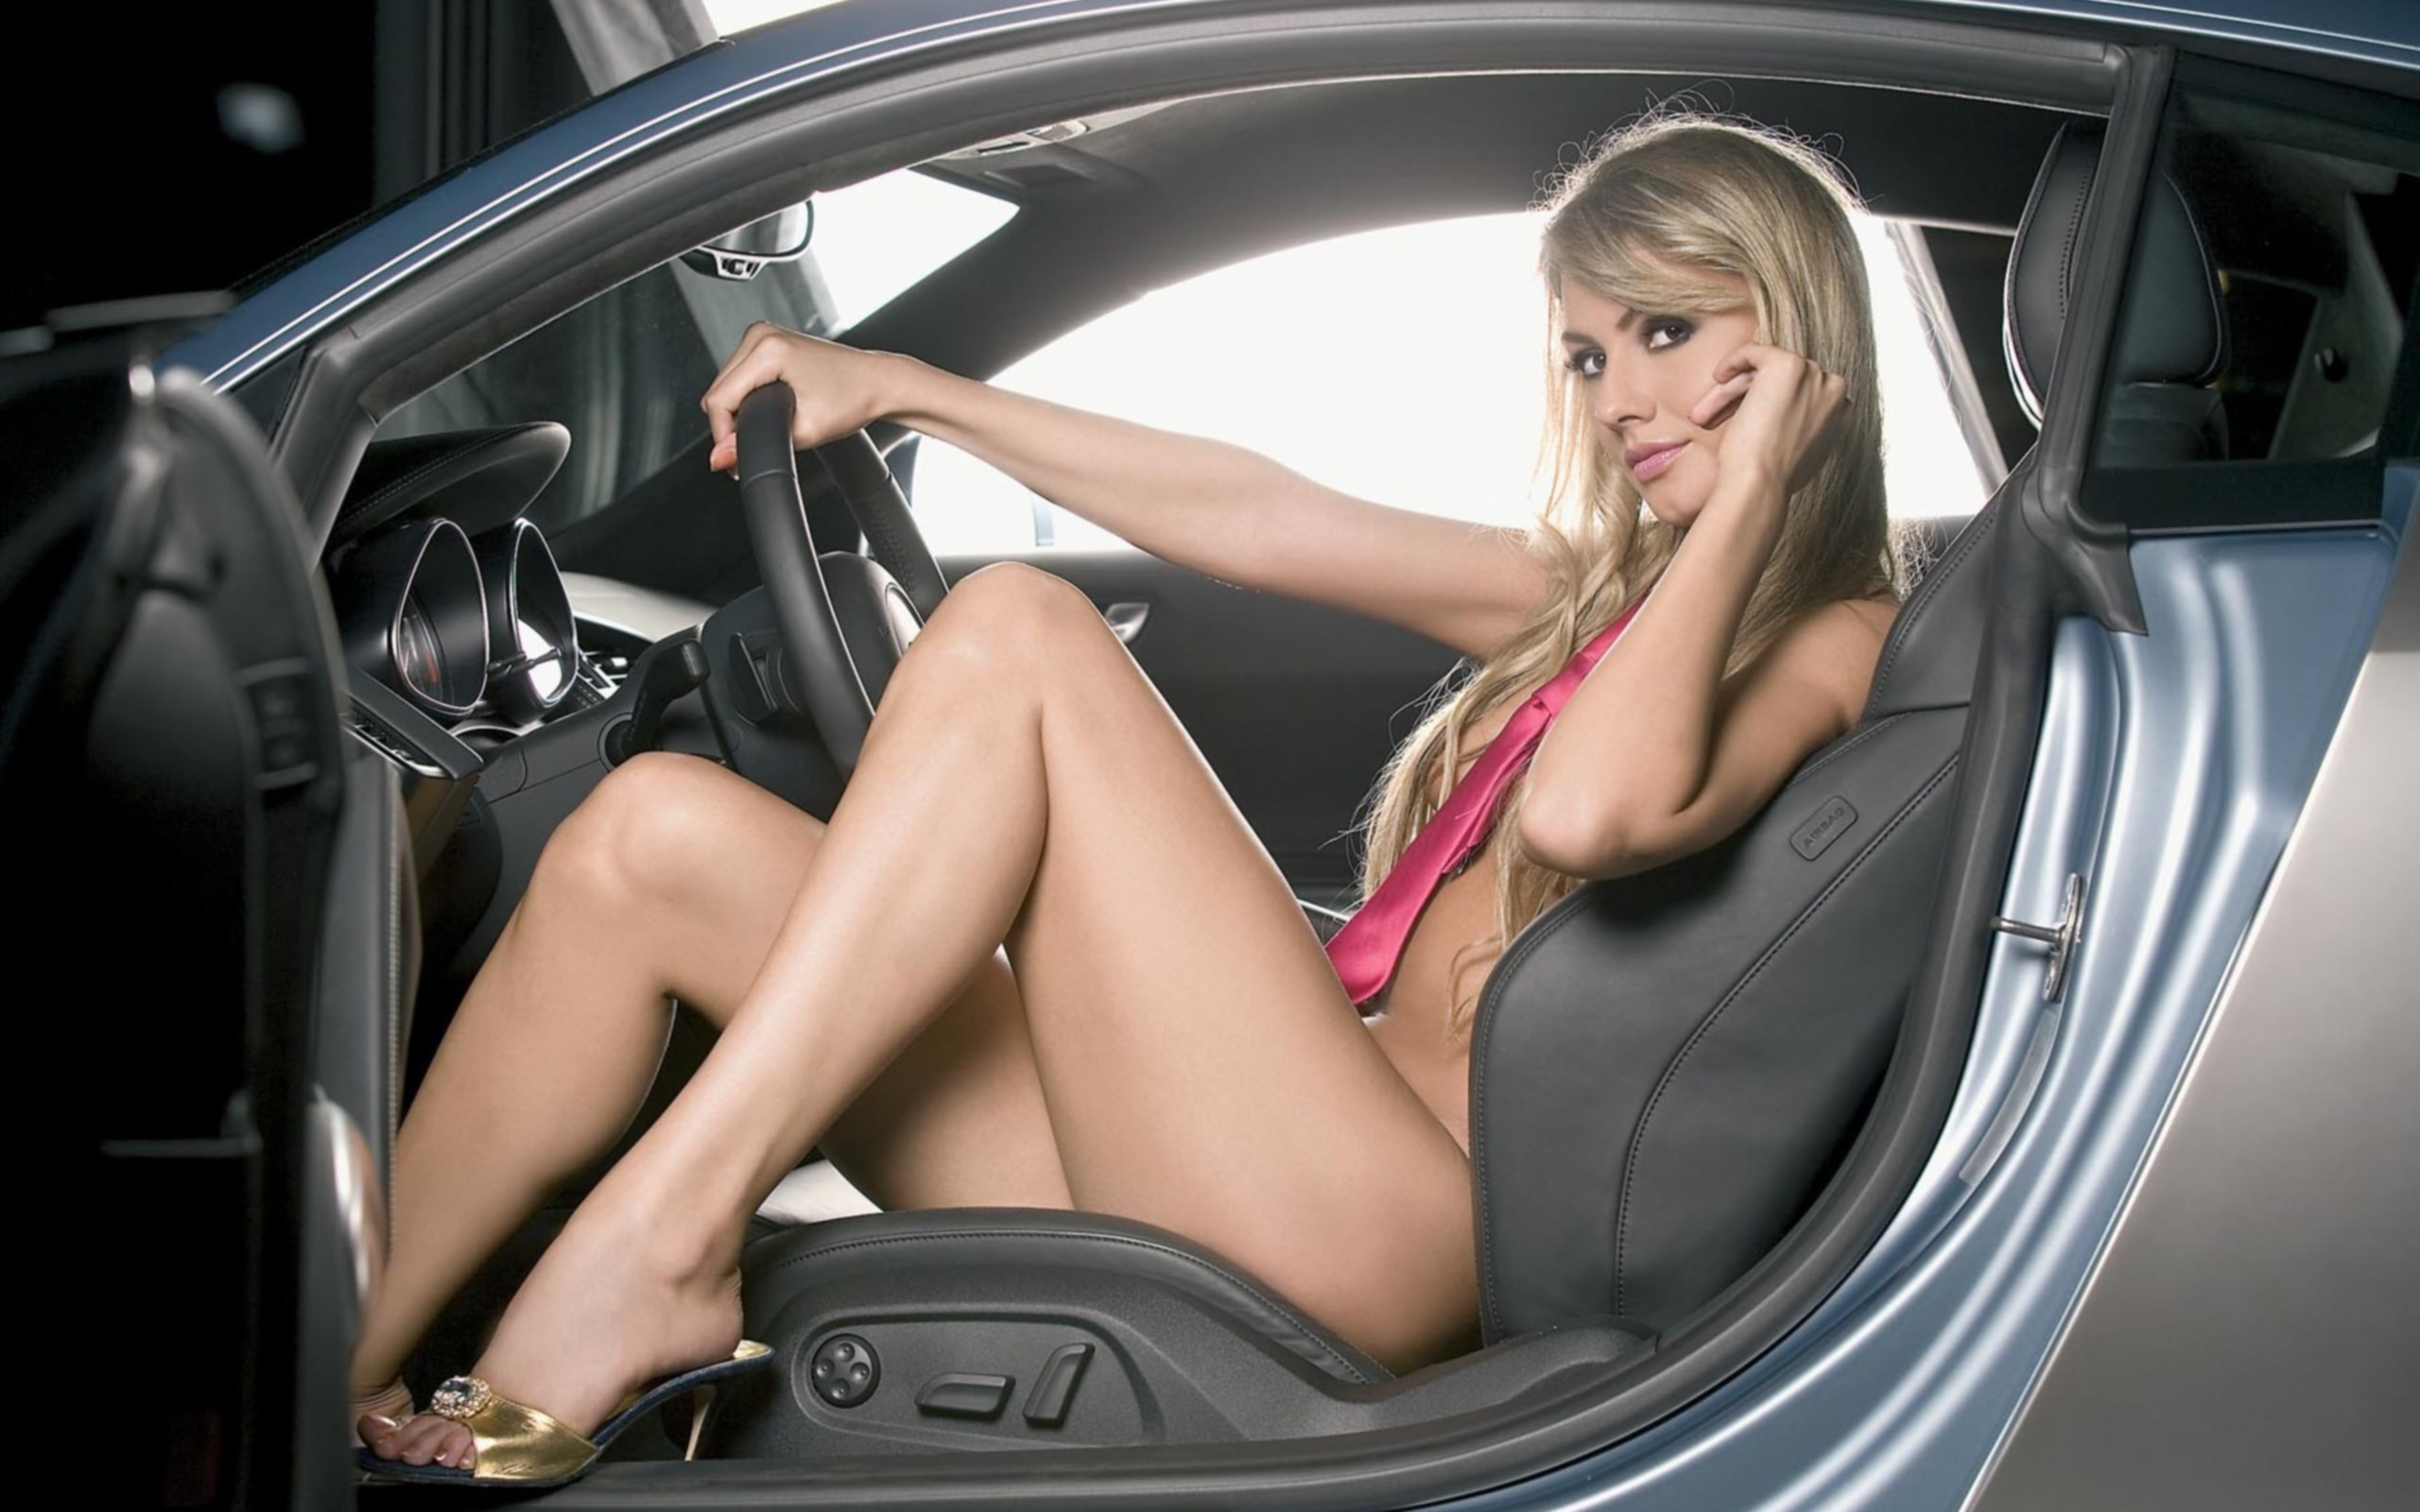 Машины и девушки секси